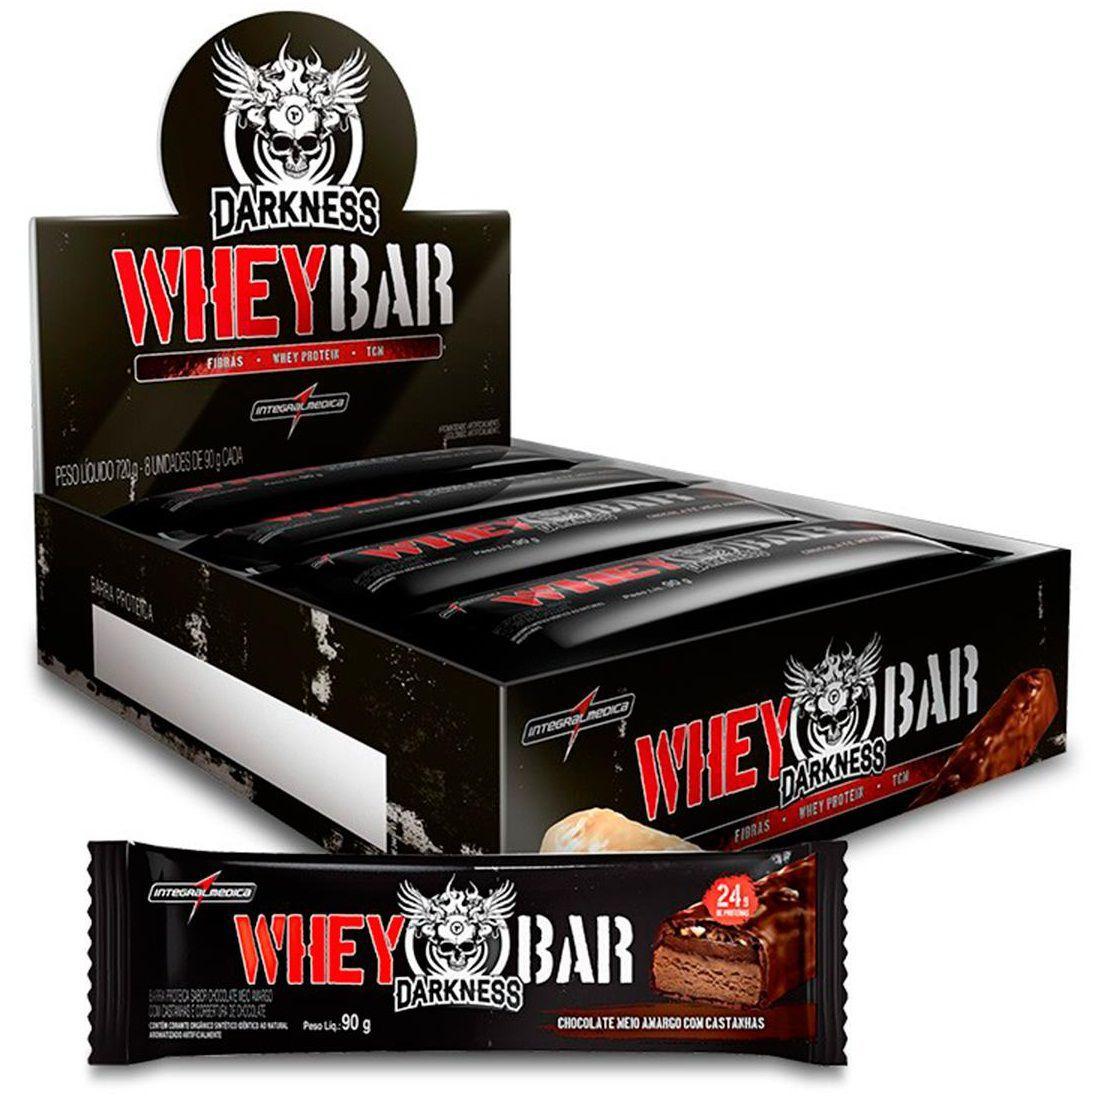 Whey Dark Bar Darkness (caixa c/ 8) - Doce de leite - IntegralMédica